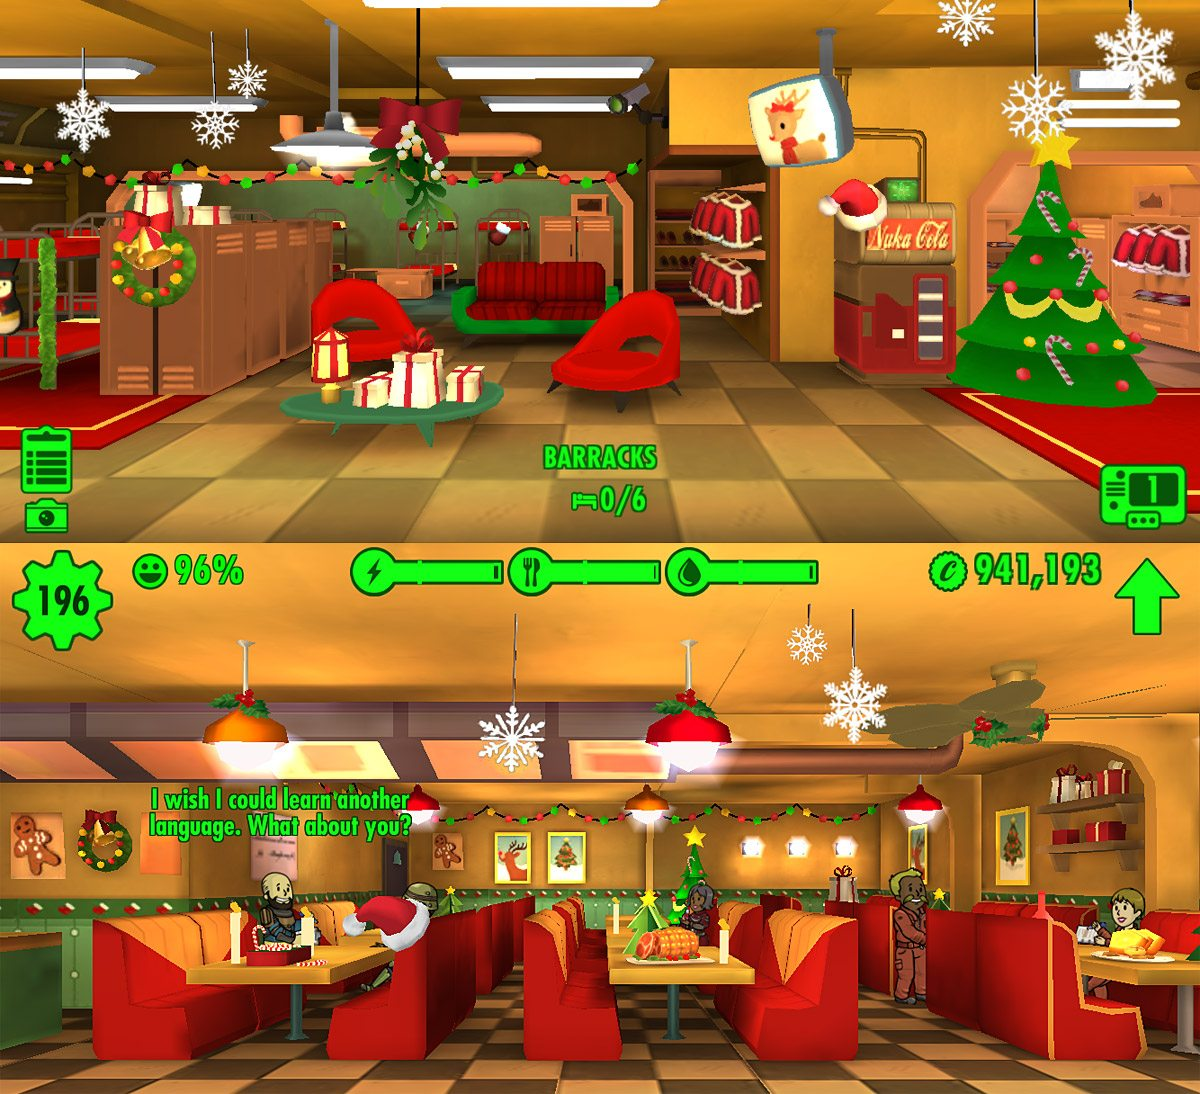 FalloutShelter-ChristmasDec